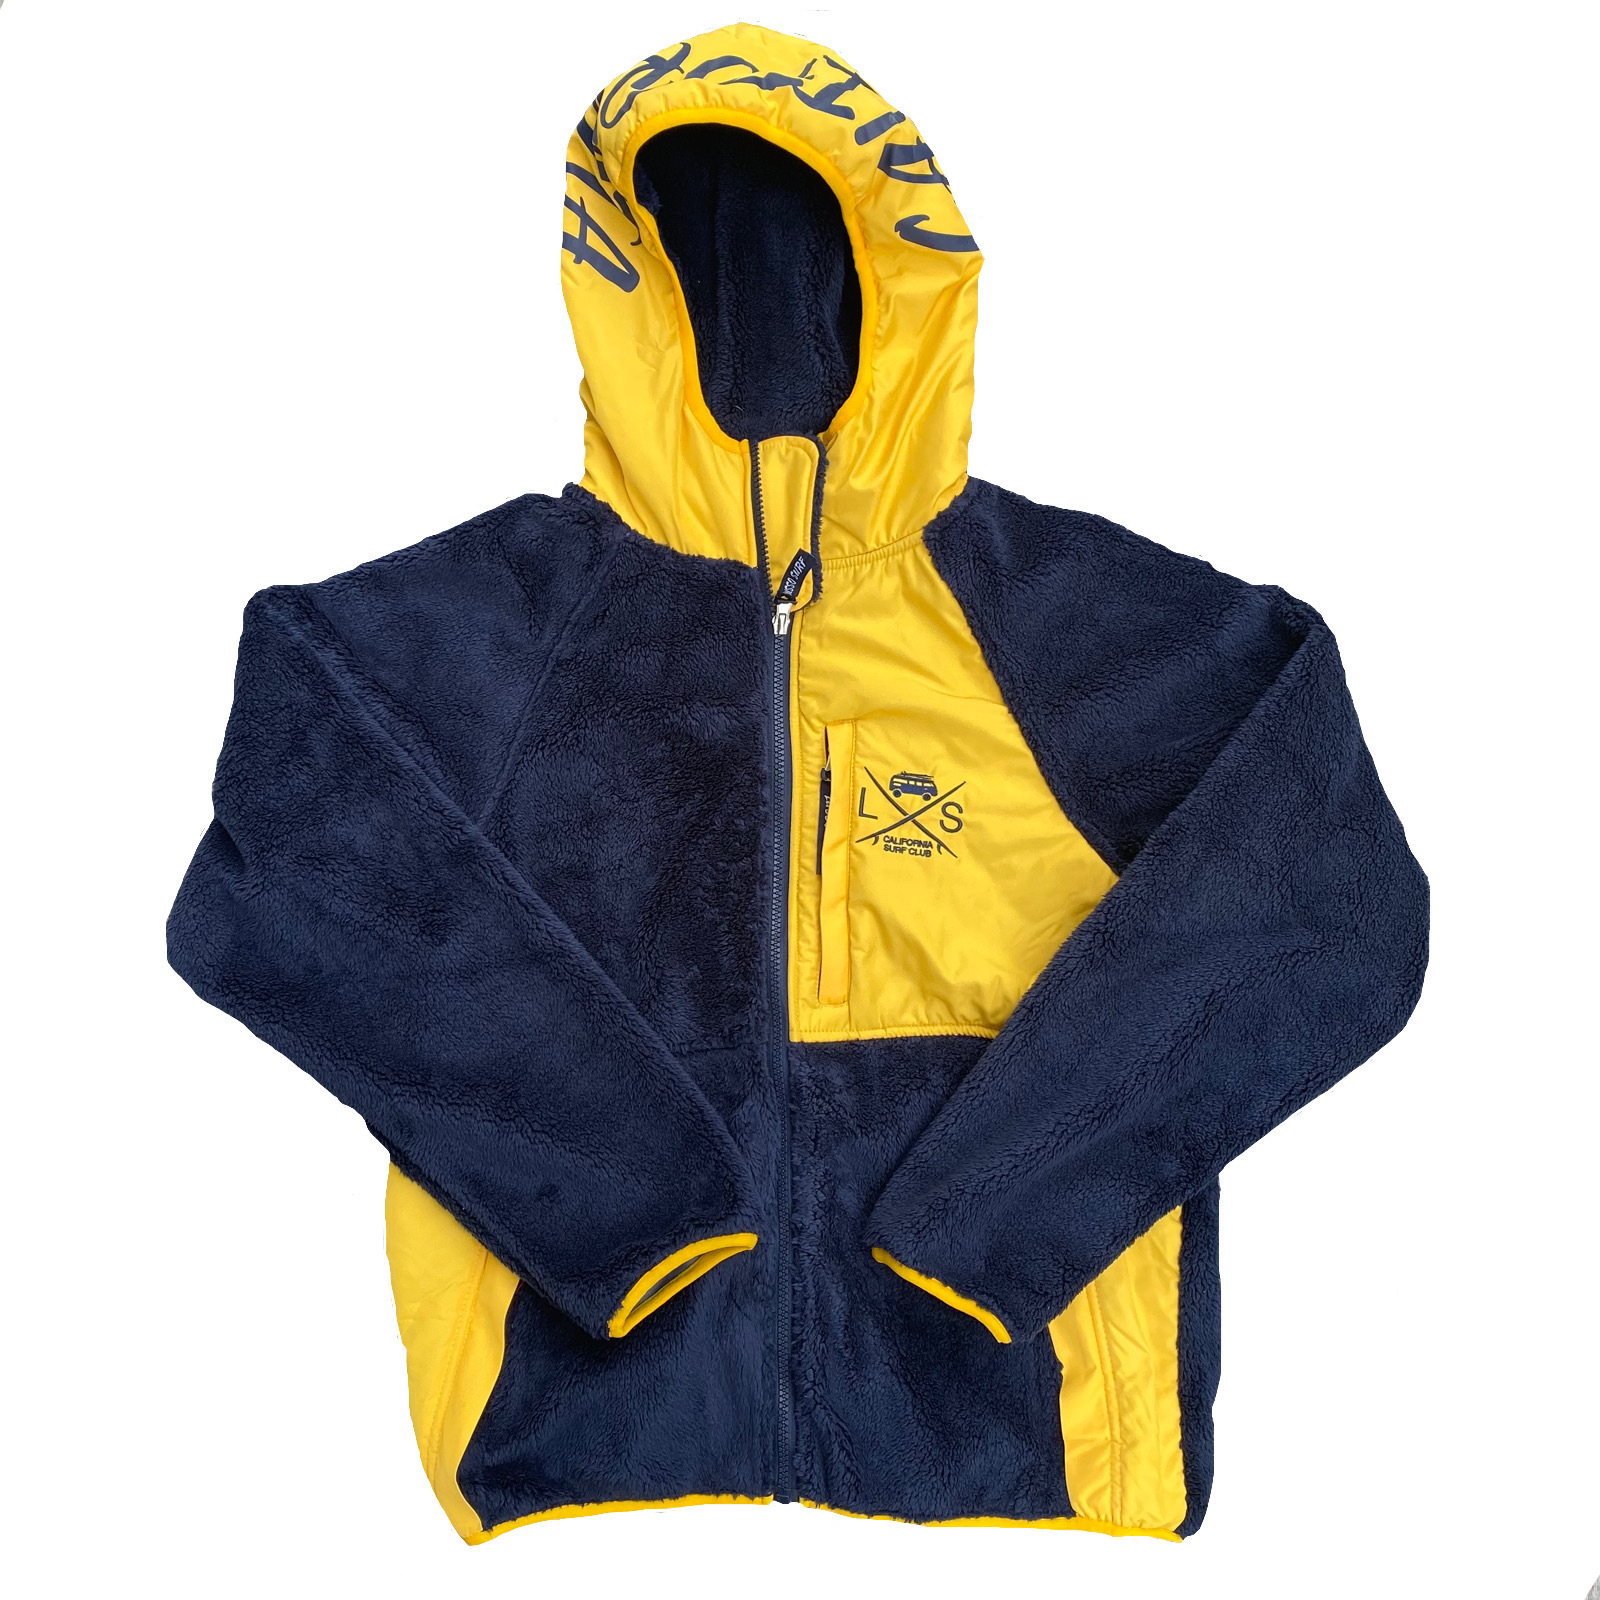 SURF BUS Fleece Jacket 【Navy × Yellow】